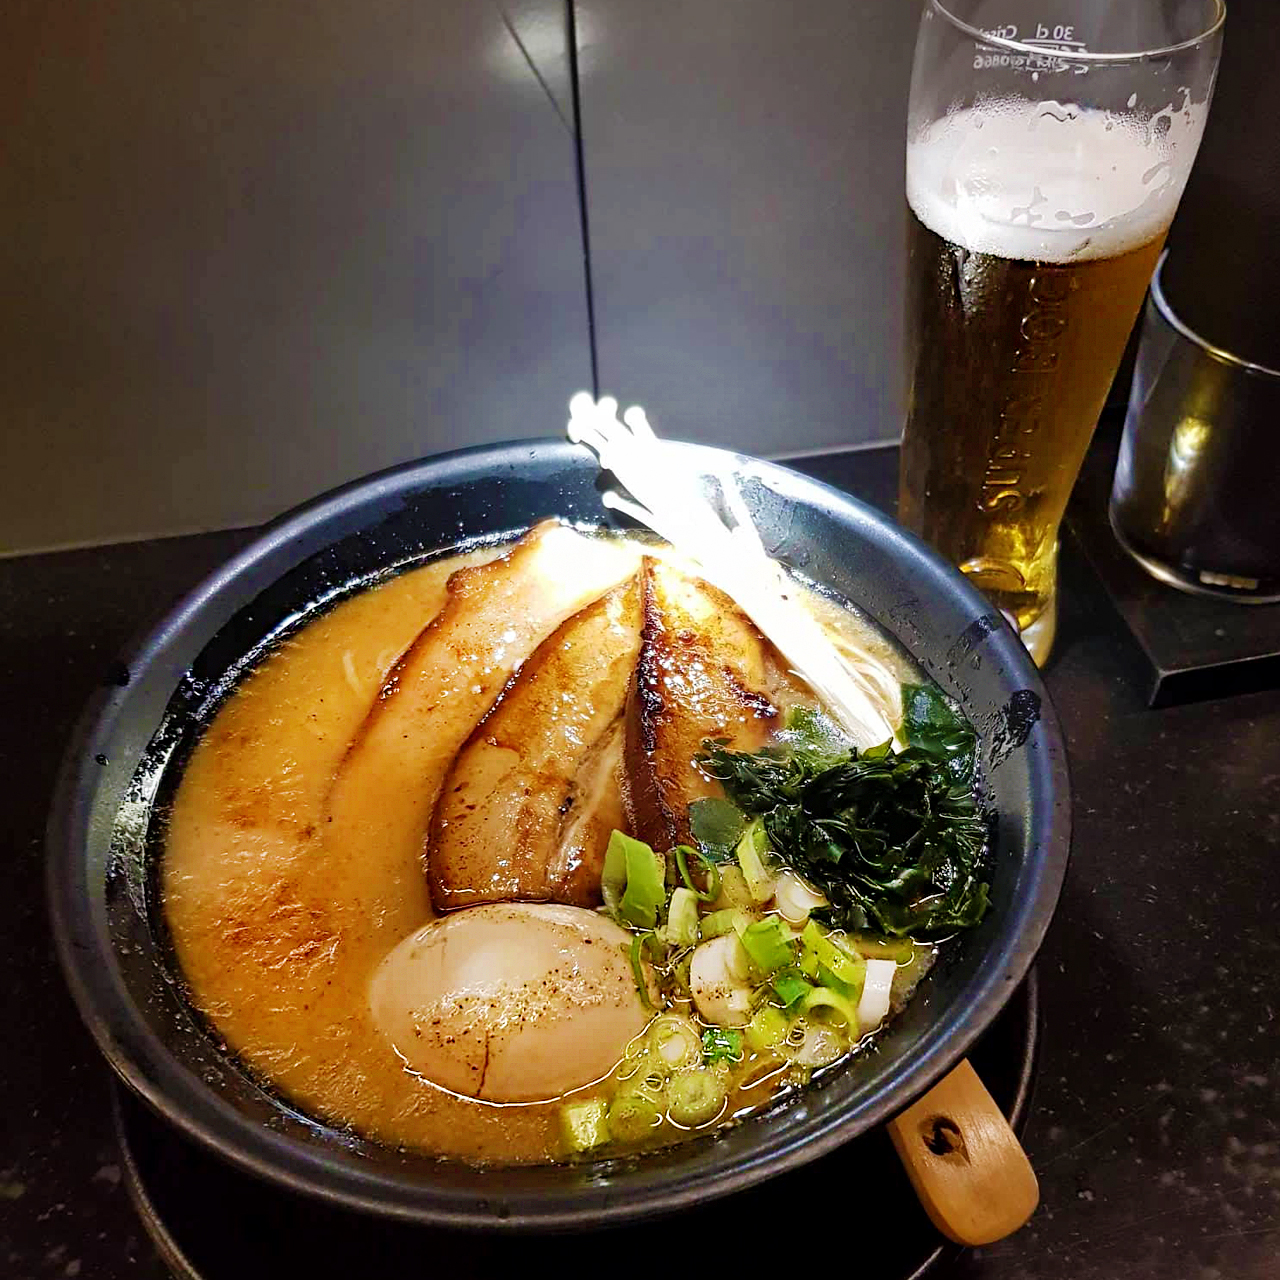 Ramen e Outros RO Restaurant Porto Portugal tonkotsu ramen noodle soup